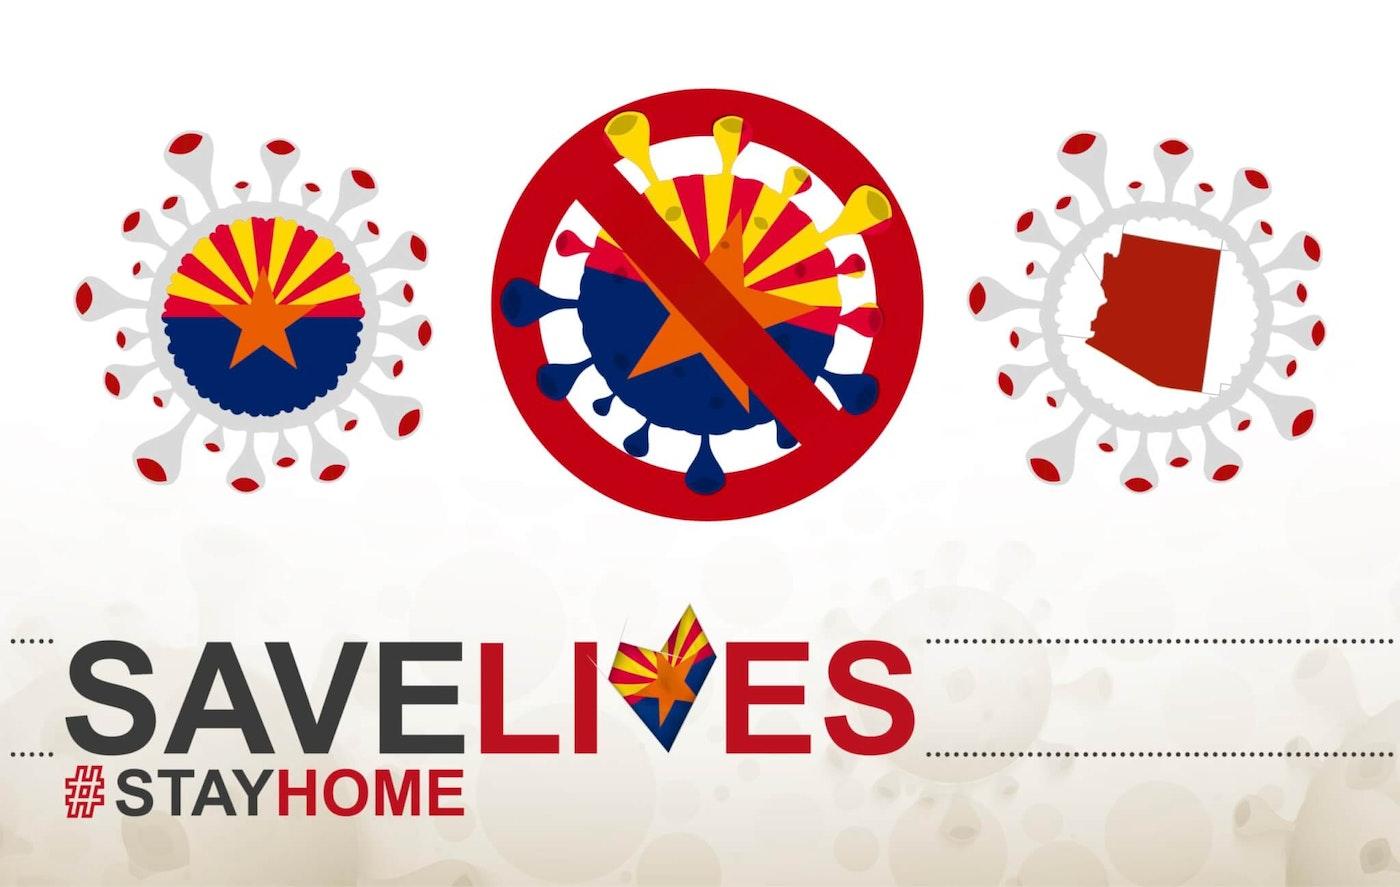 Save Lives Stock Photo